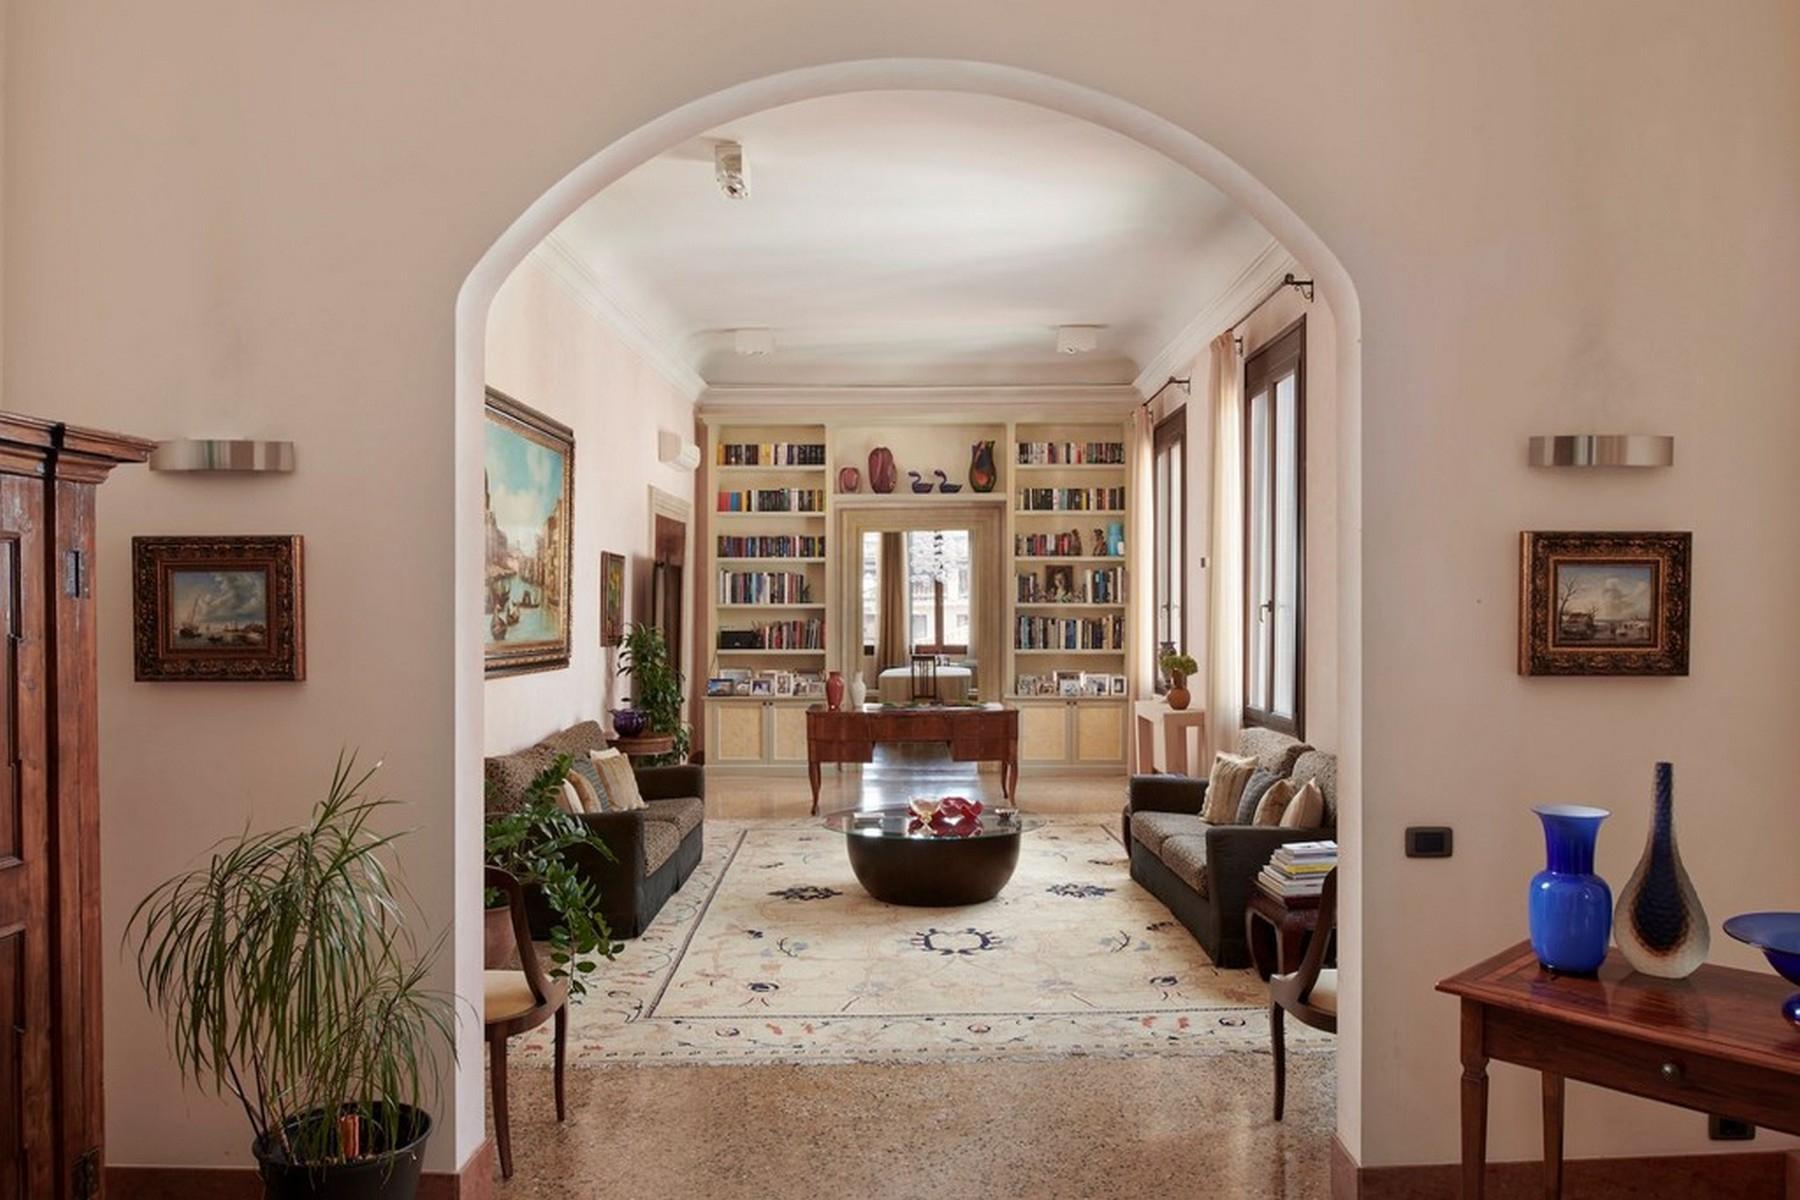 Elegante secondo Piano Nobile in un Palazzo - 2